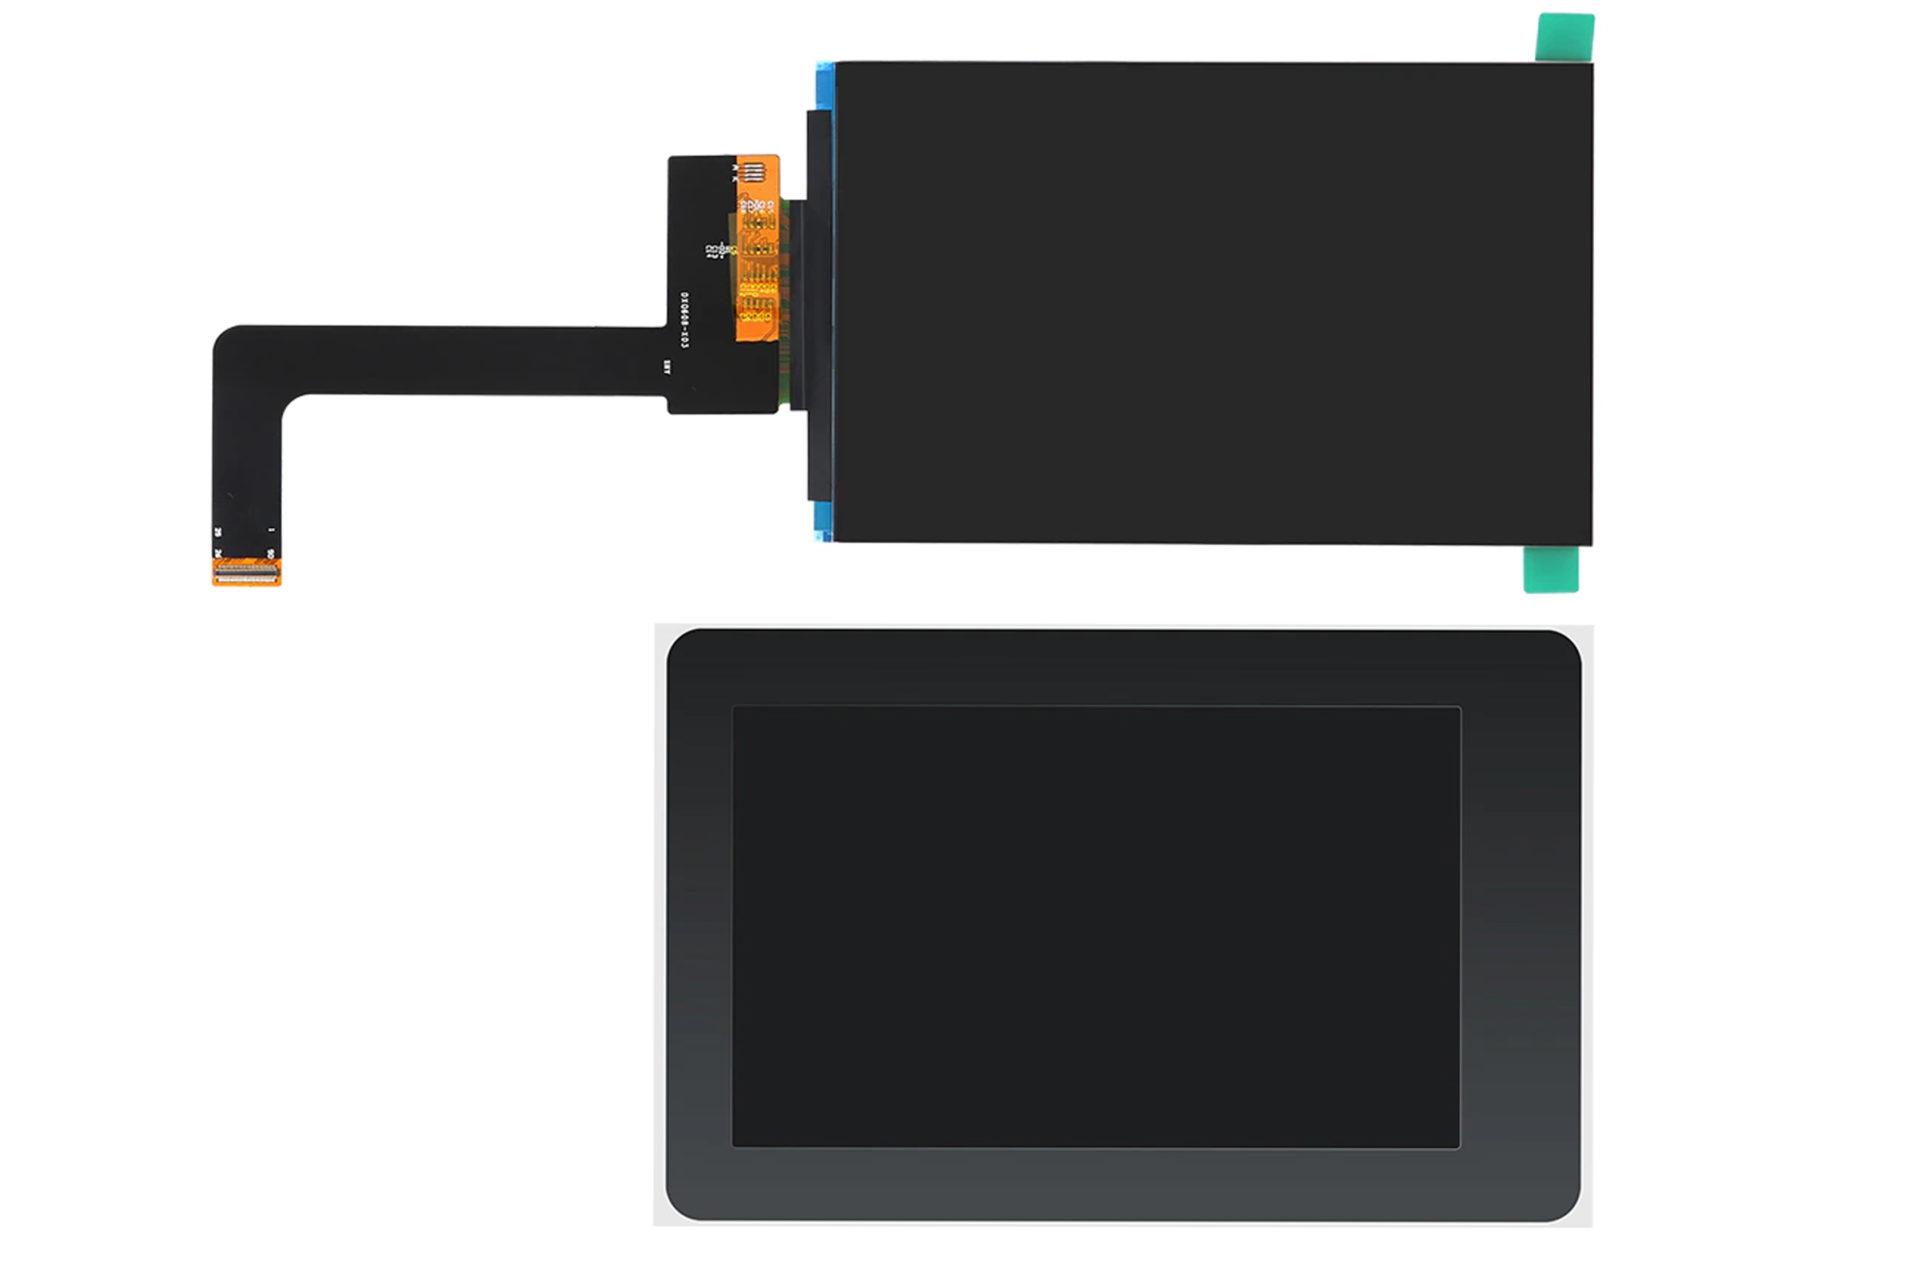 Дисплей (Матрица) LCD 4K для Anycubic Photon Mono купить украина 1